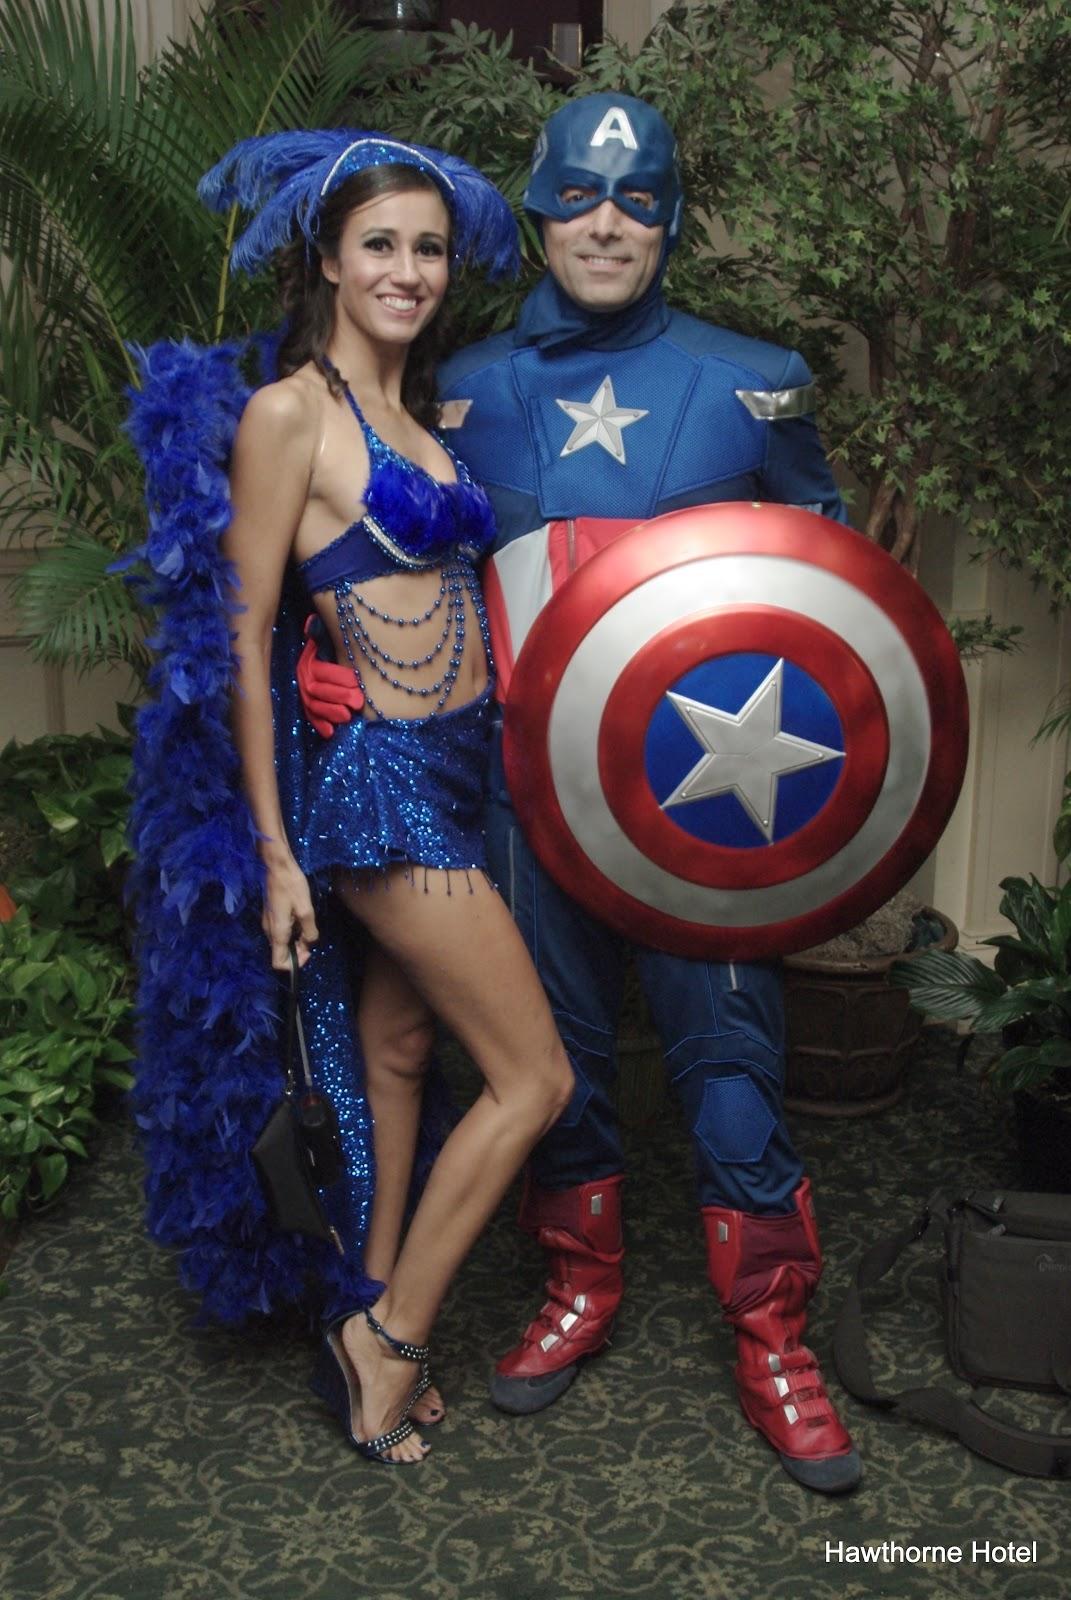 Hawthorne Hotel: Annual Halloween Ball At the Hawthorne Hotel ...